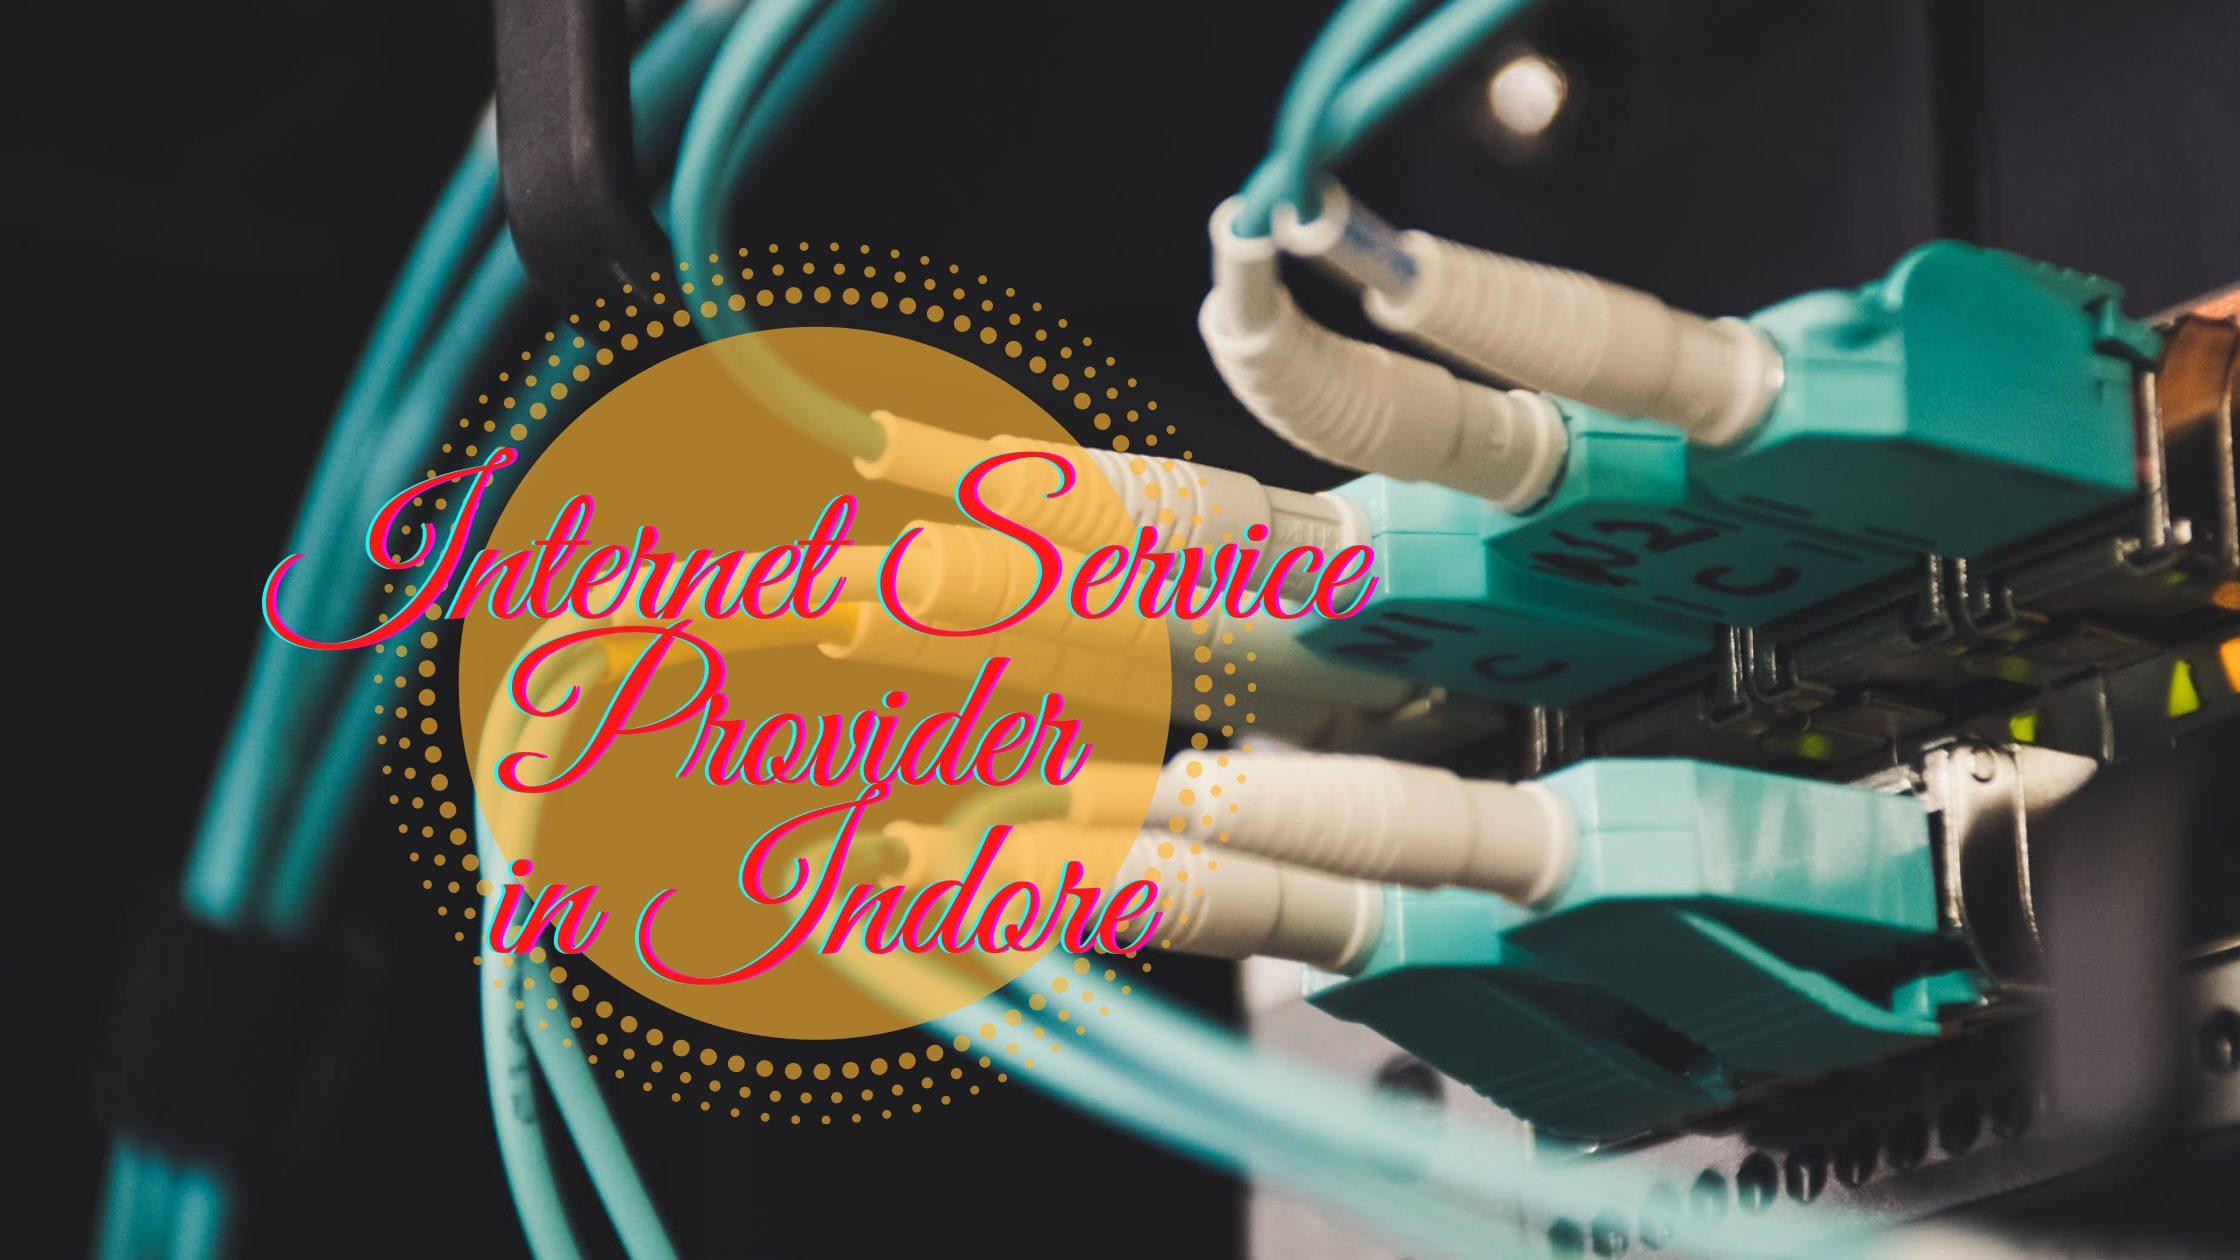 Best Internet Service Provider in indore